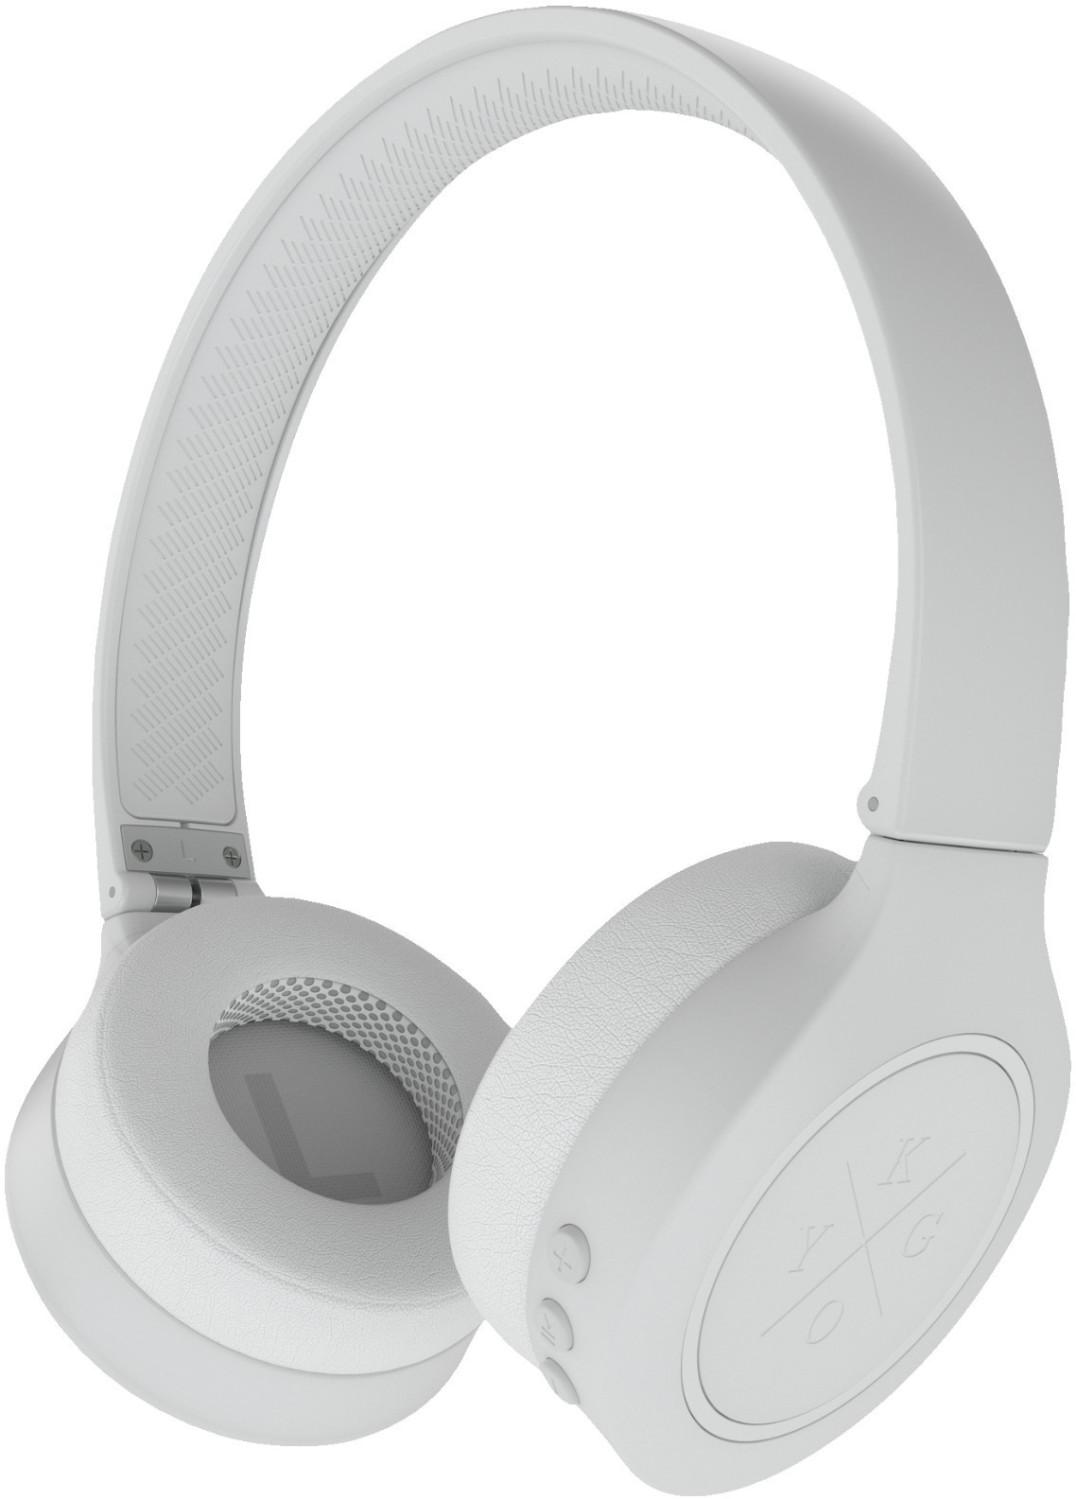 Image of Kygo A4/300 White